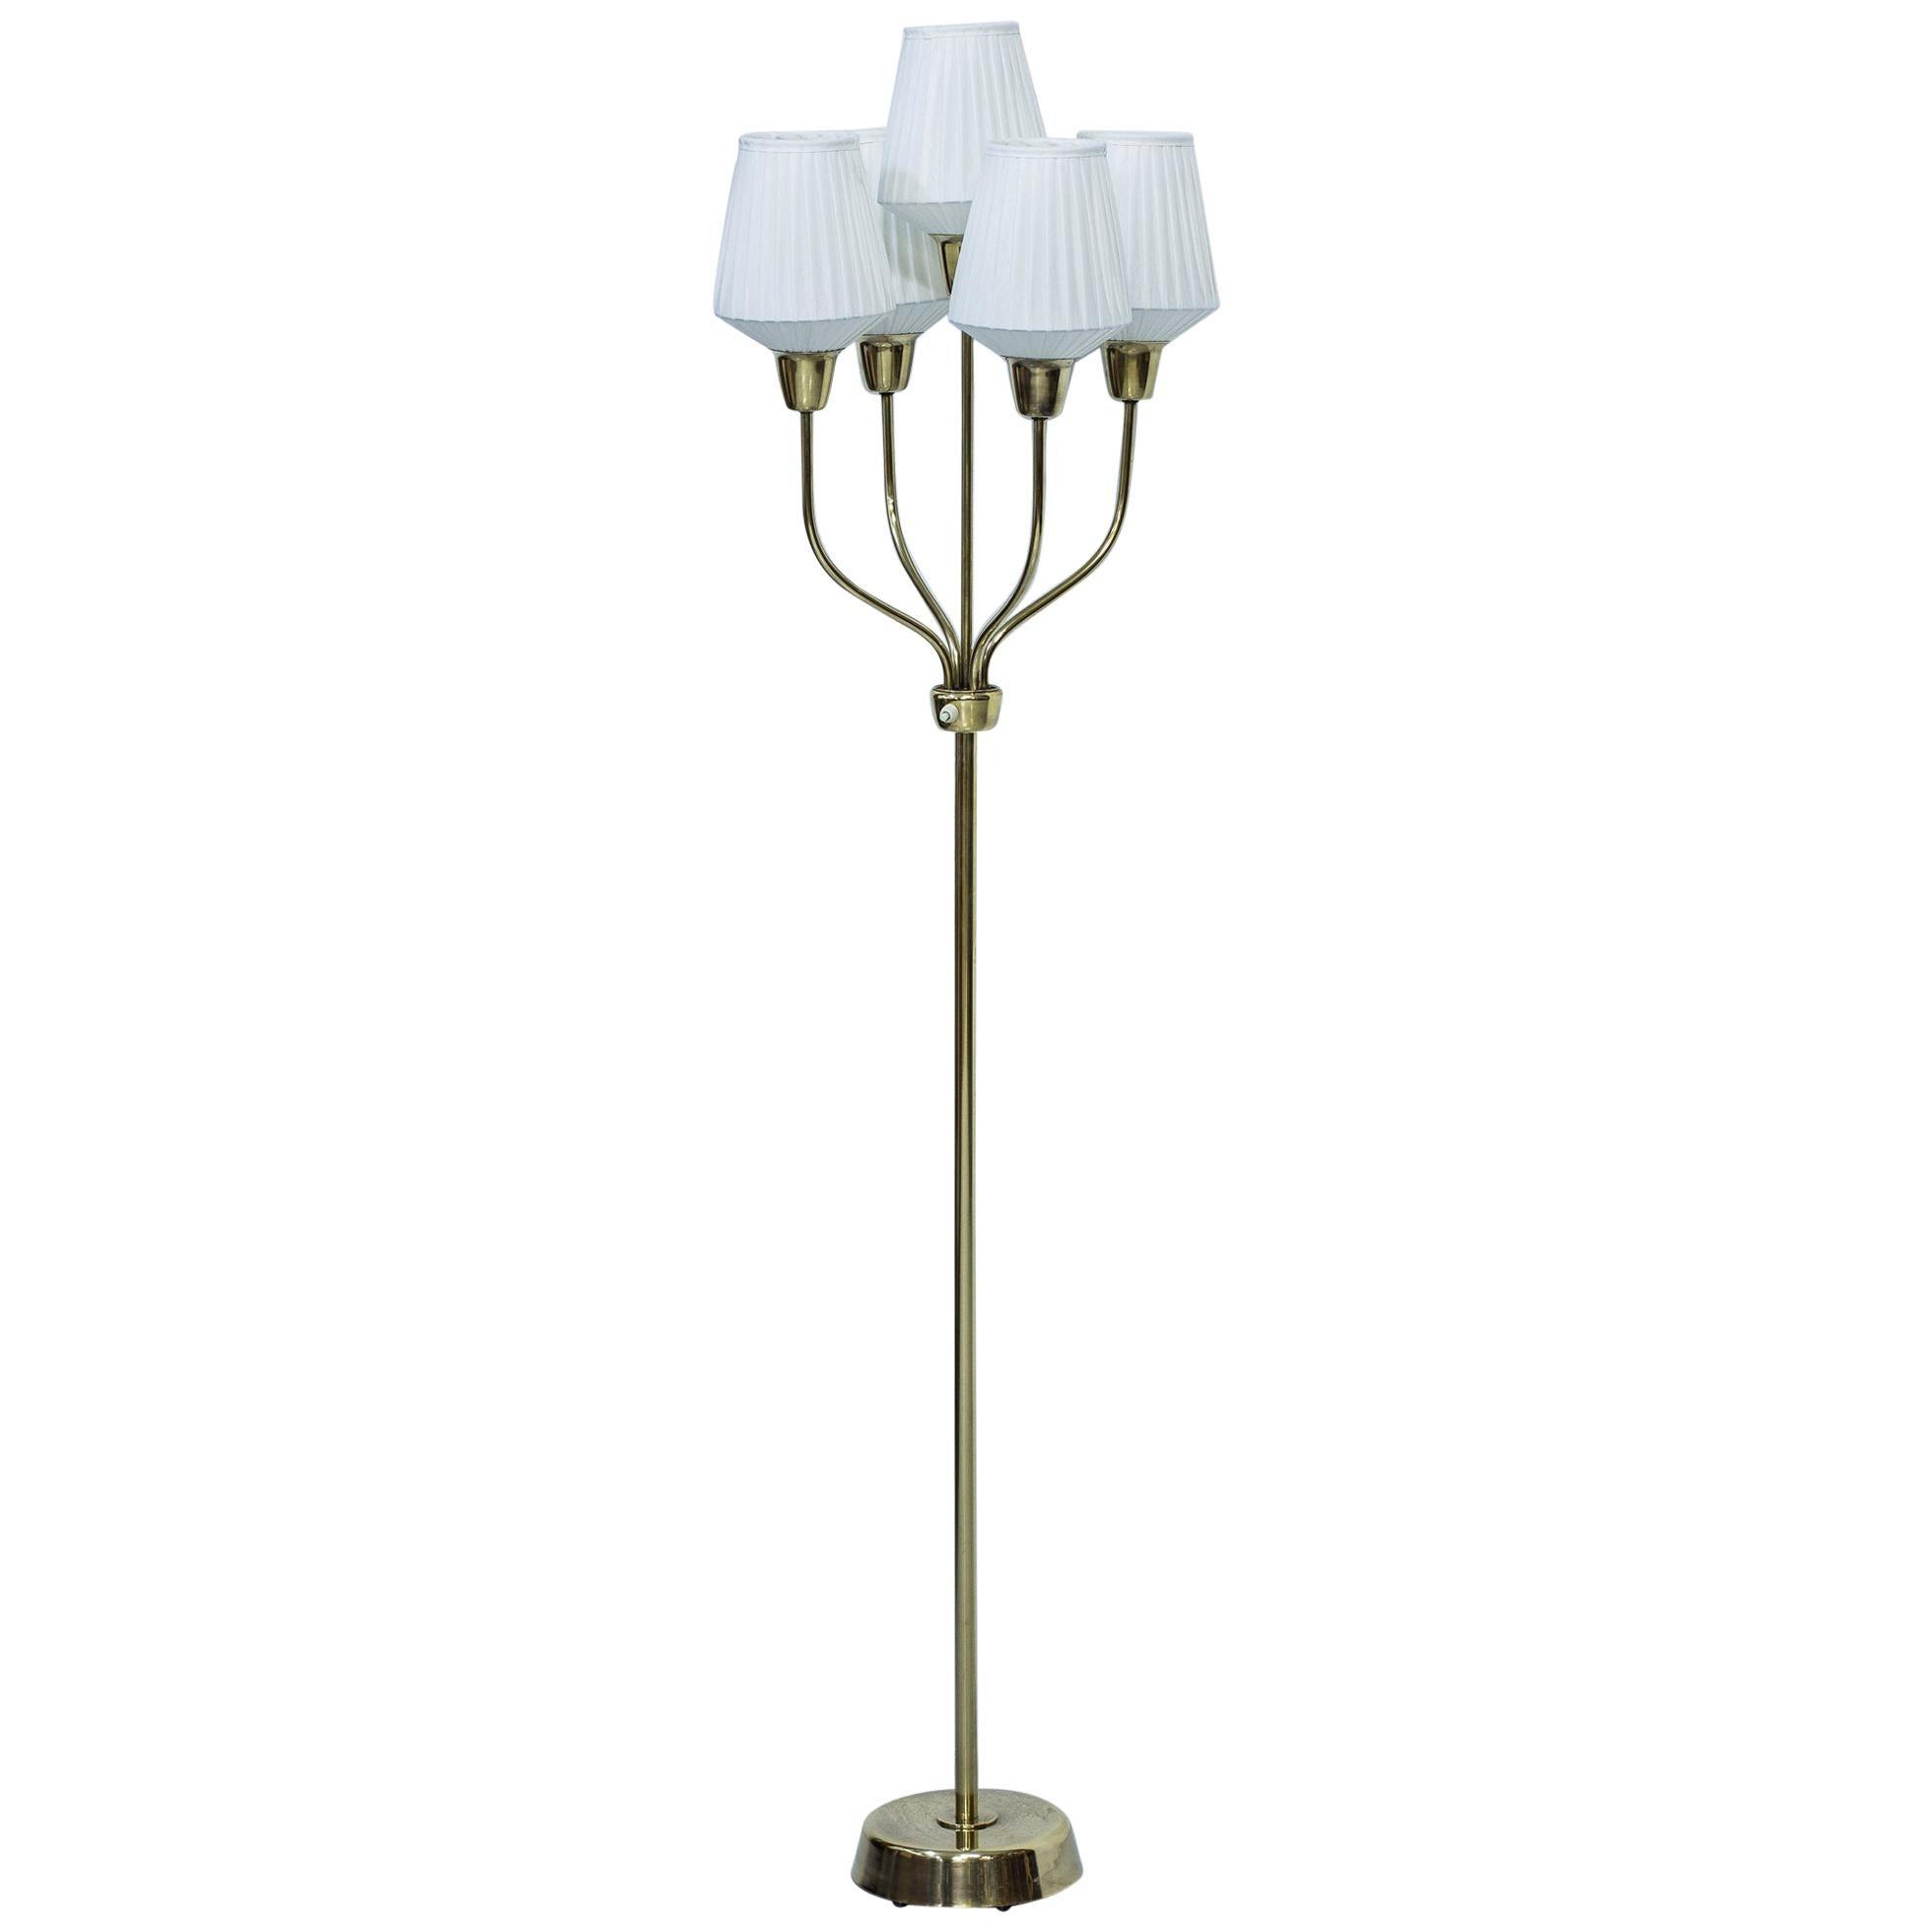 Rare Swedish Modern brass Floor Lamp by Hans Bergström, Ateljé Lyktan, 1940s